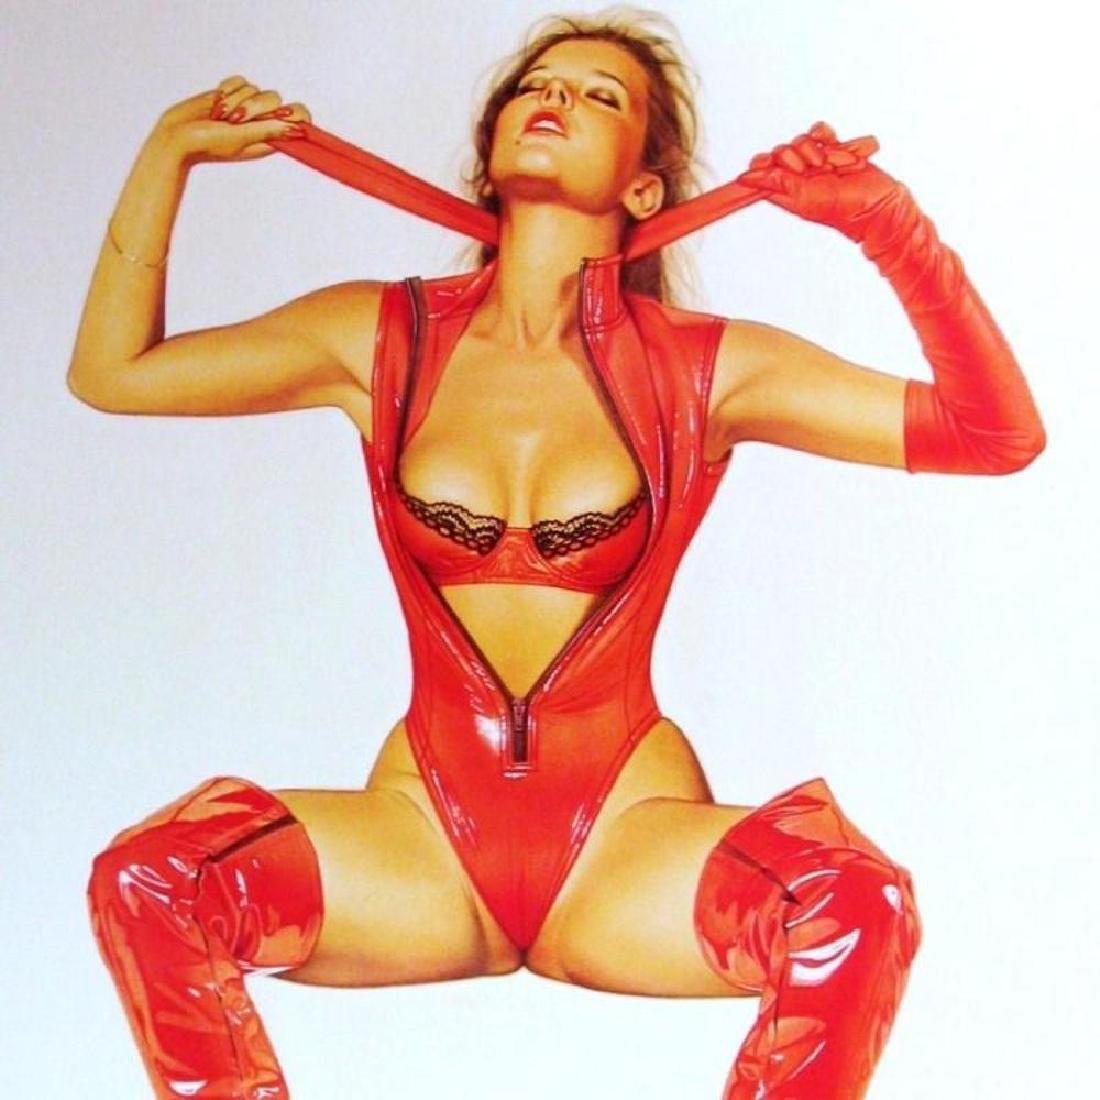 Sorayama Print Erotic Nude Red Leather Large - 3